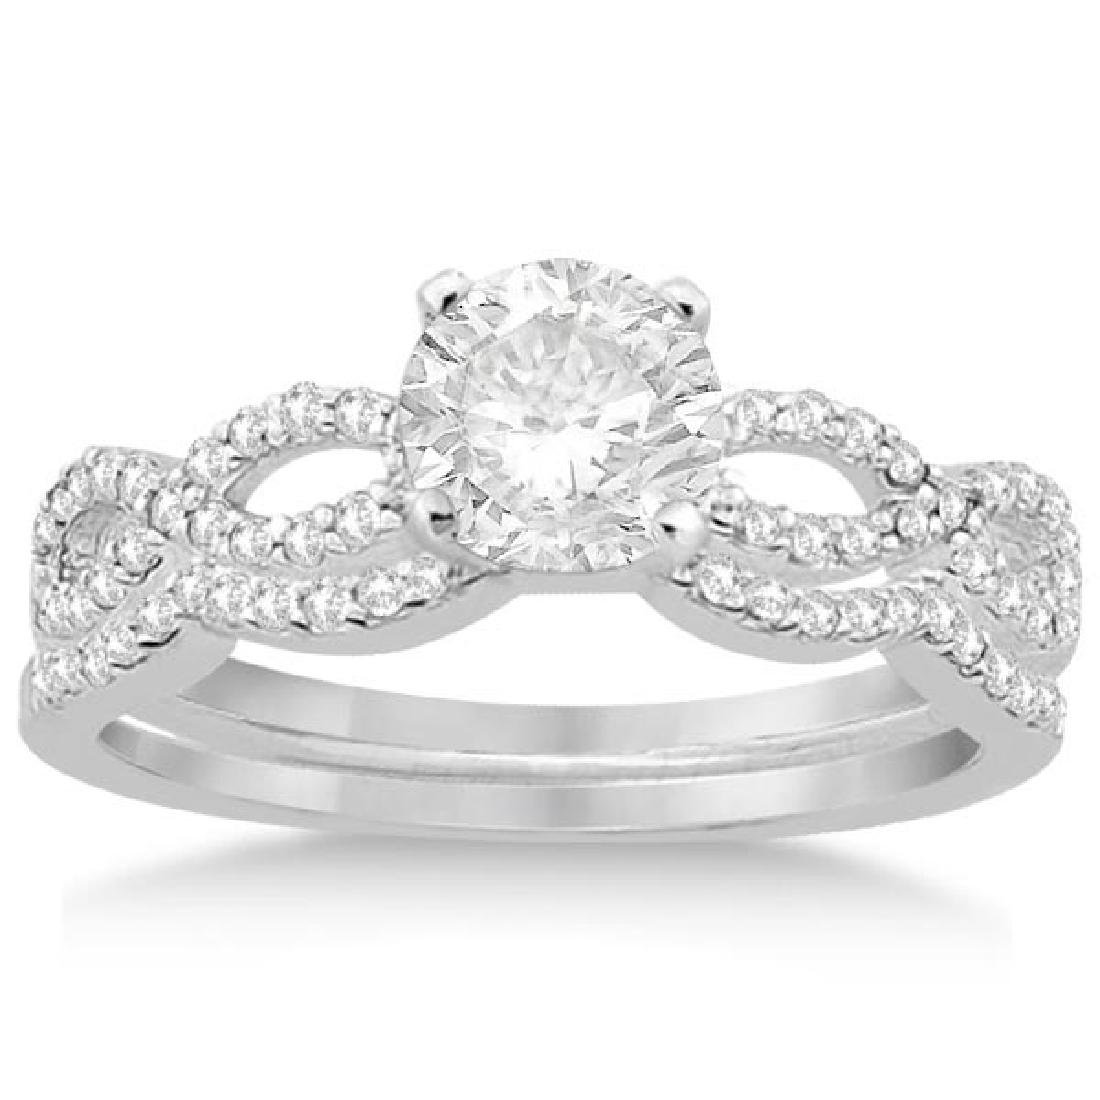 Infinity Twisted Diamond Matching Bridal Set in 18K Whi